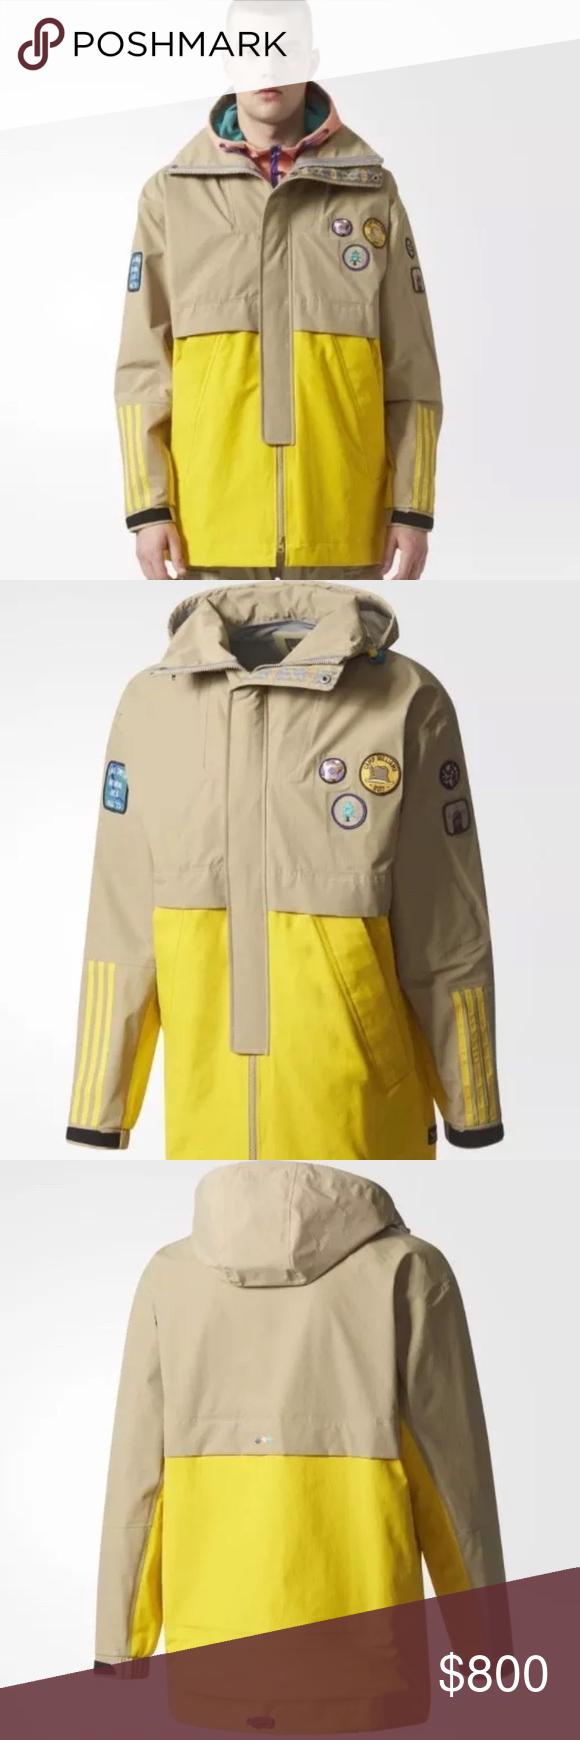 dd89fcf73064 adidas Pharrell Williams HU 3-Layer Hiking Jacket Selling brand new ...